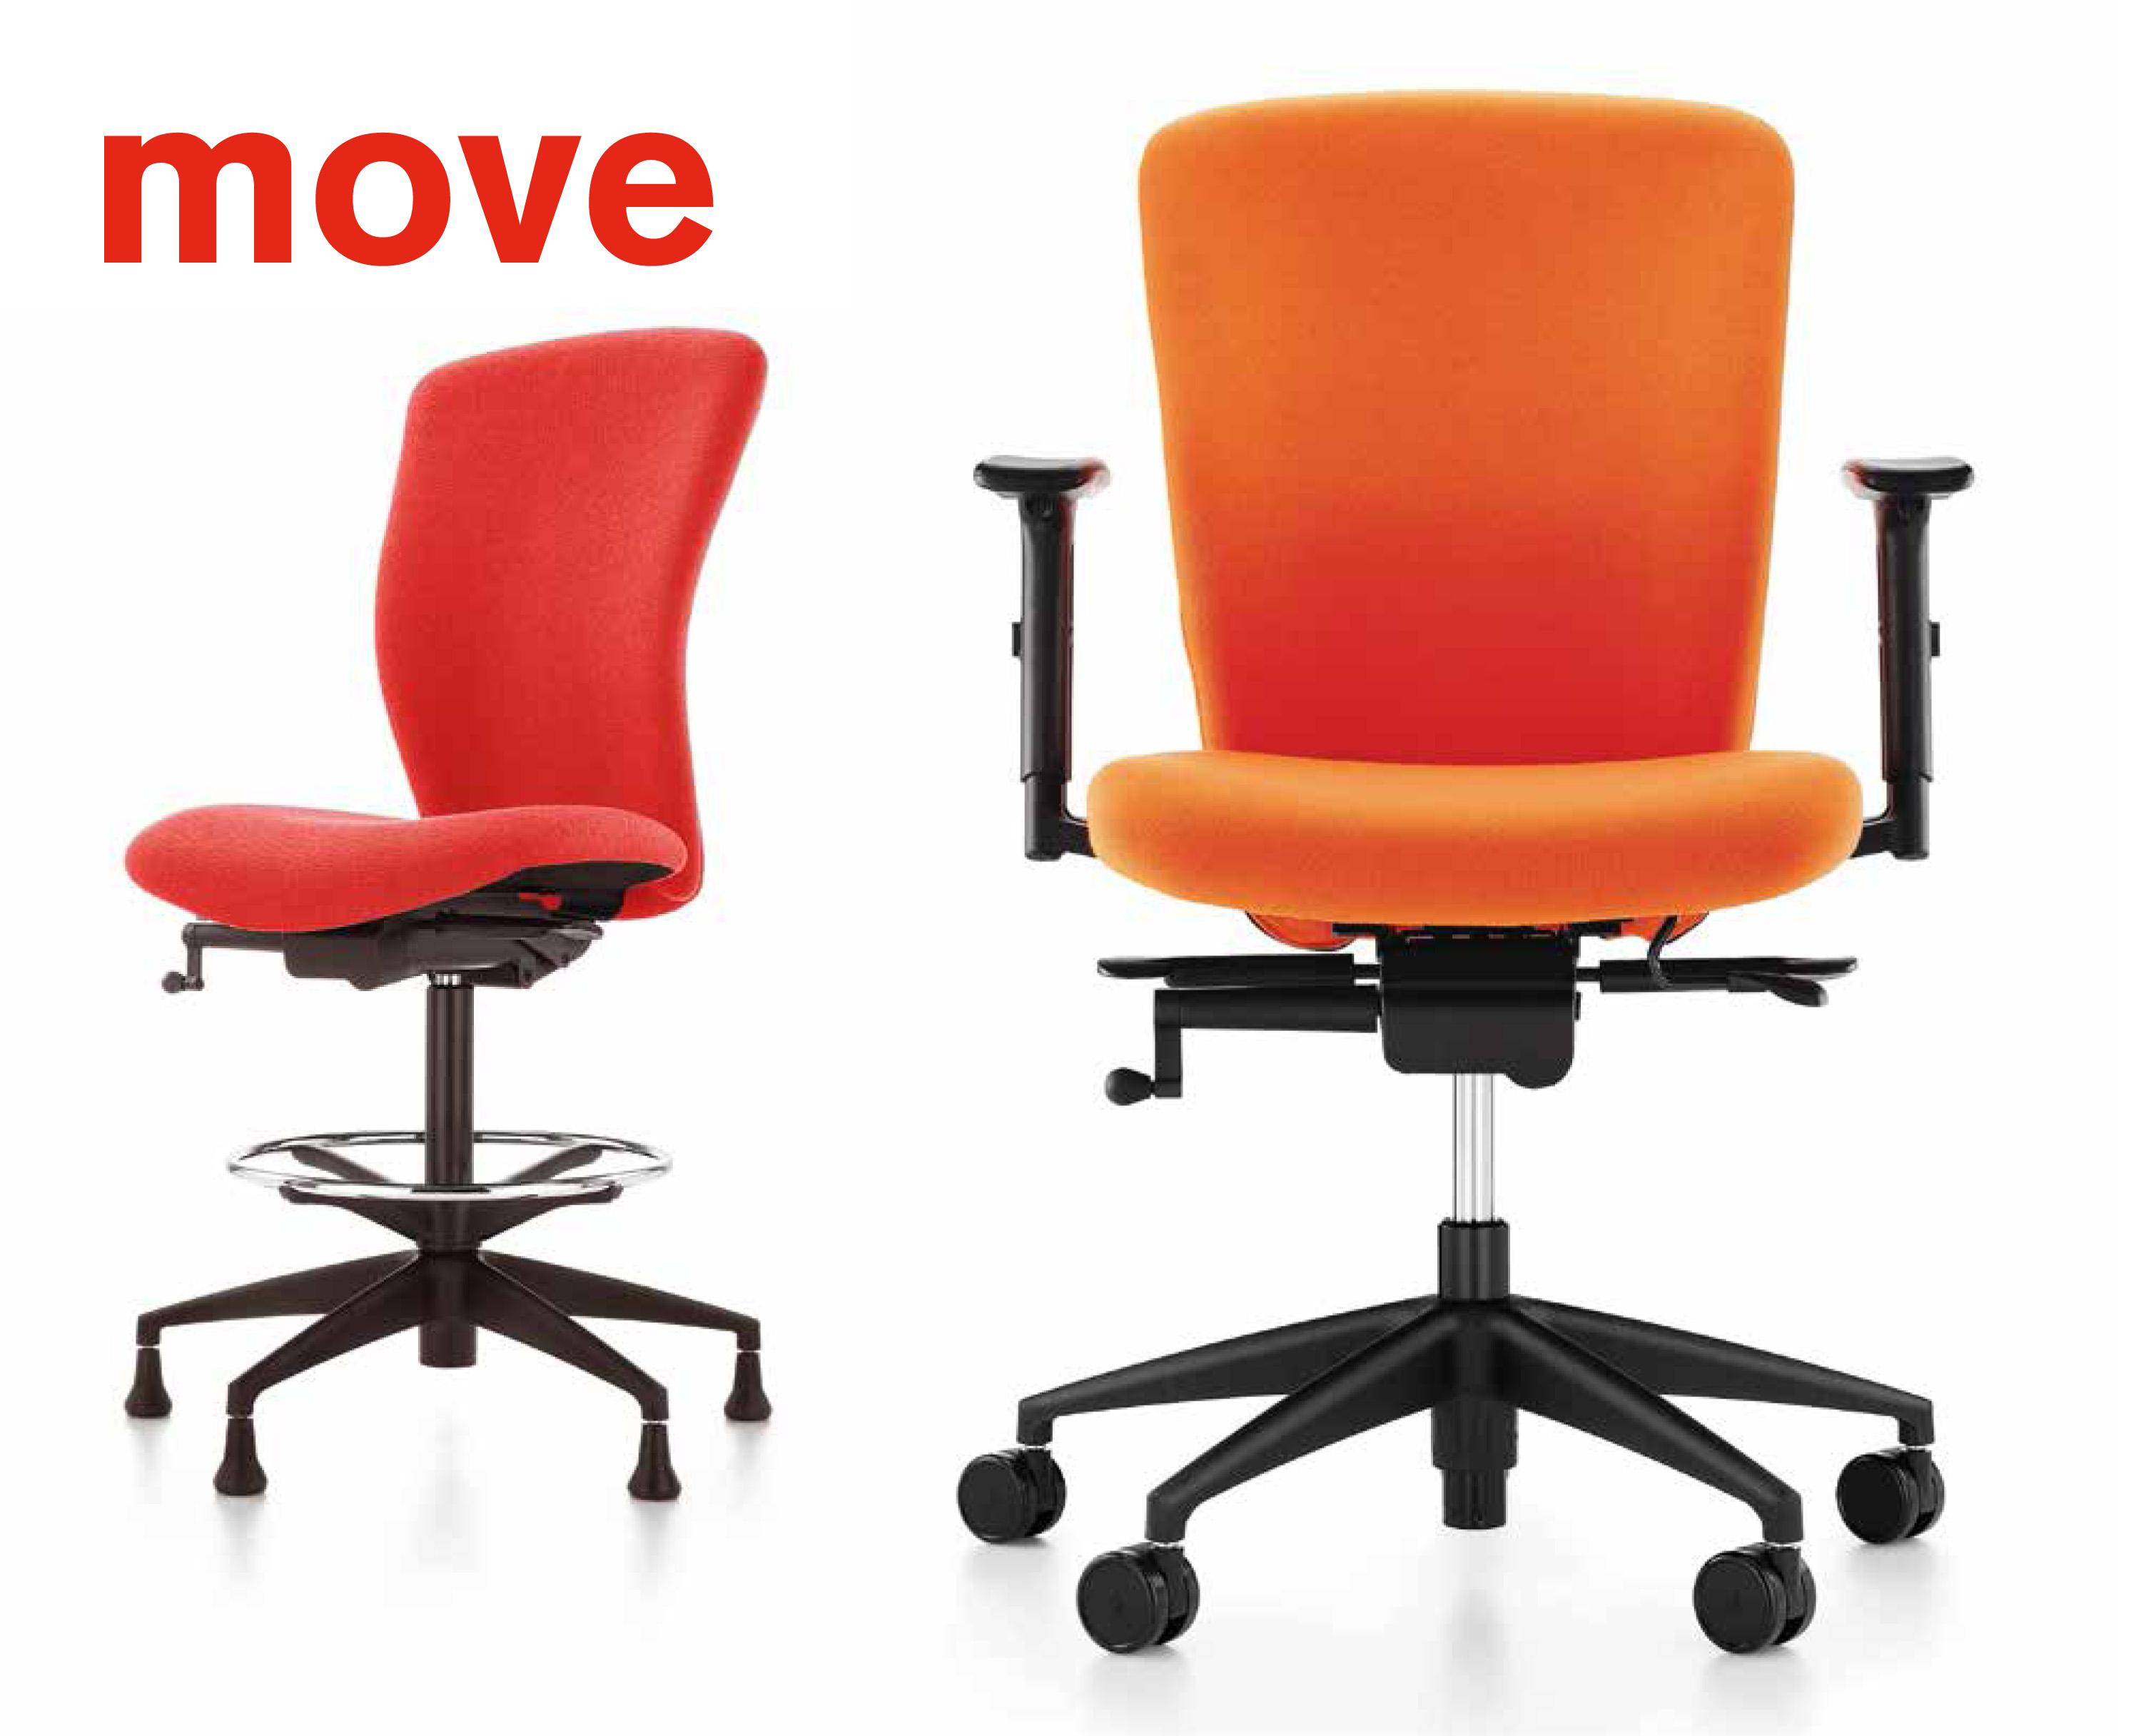 komac-move-page.jpg